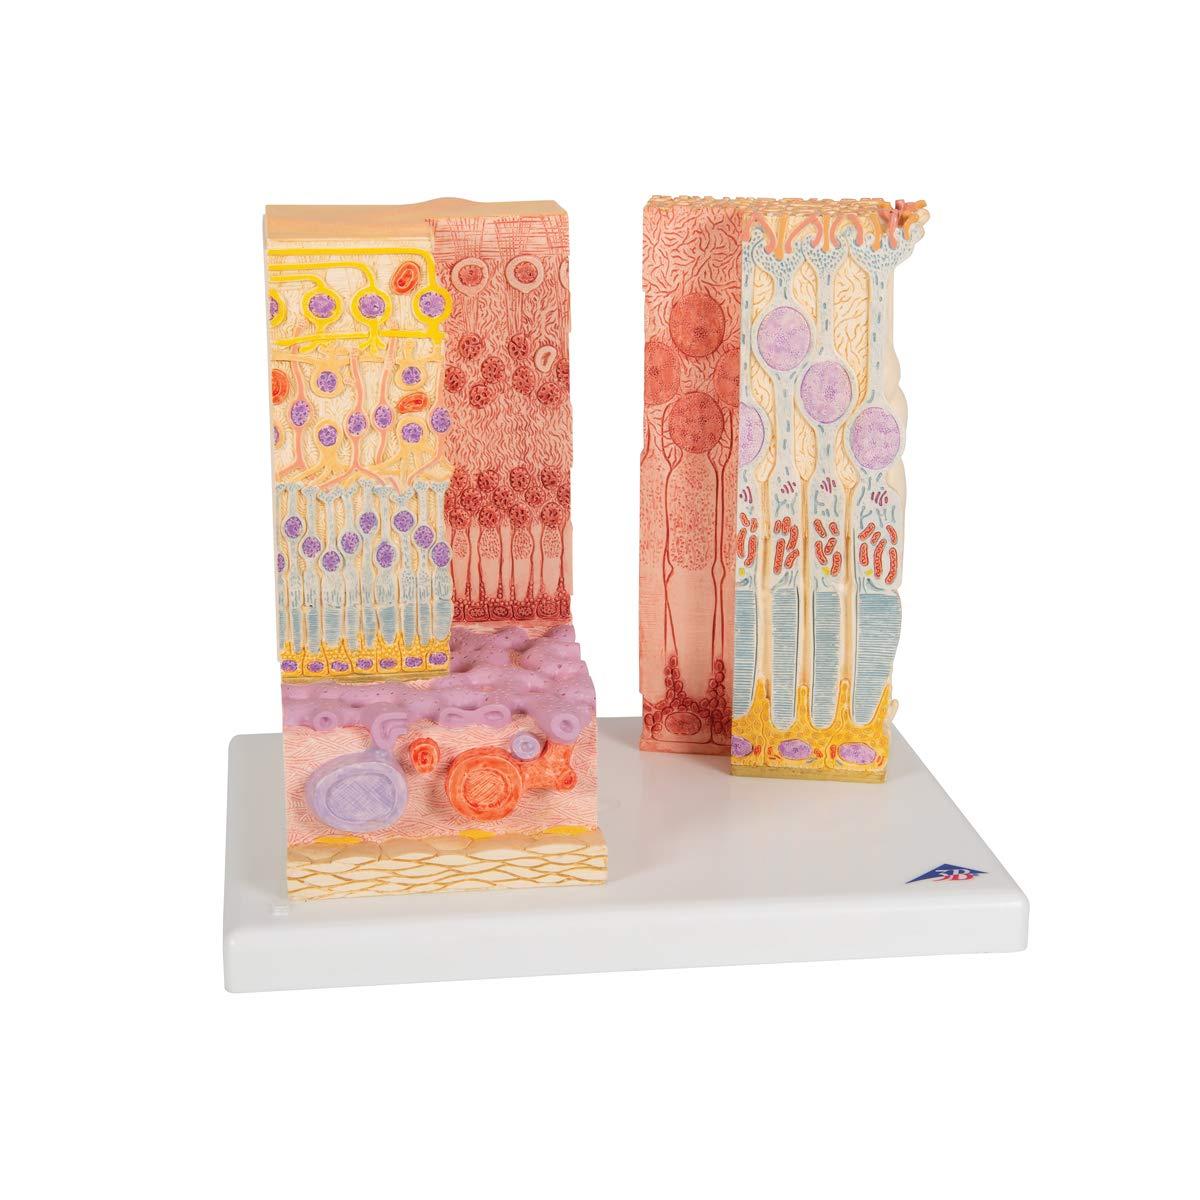 3dRose cst/_17301/_3 Dachshund Barking Machine-Ceramic Tile Coasters Set of 4